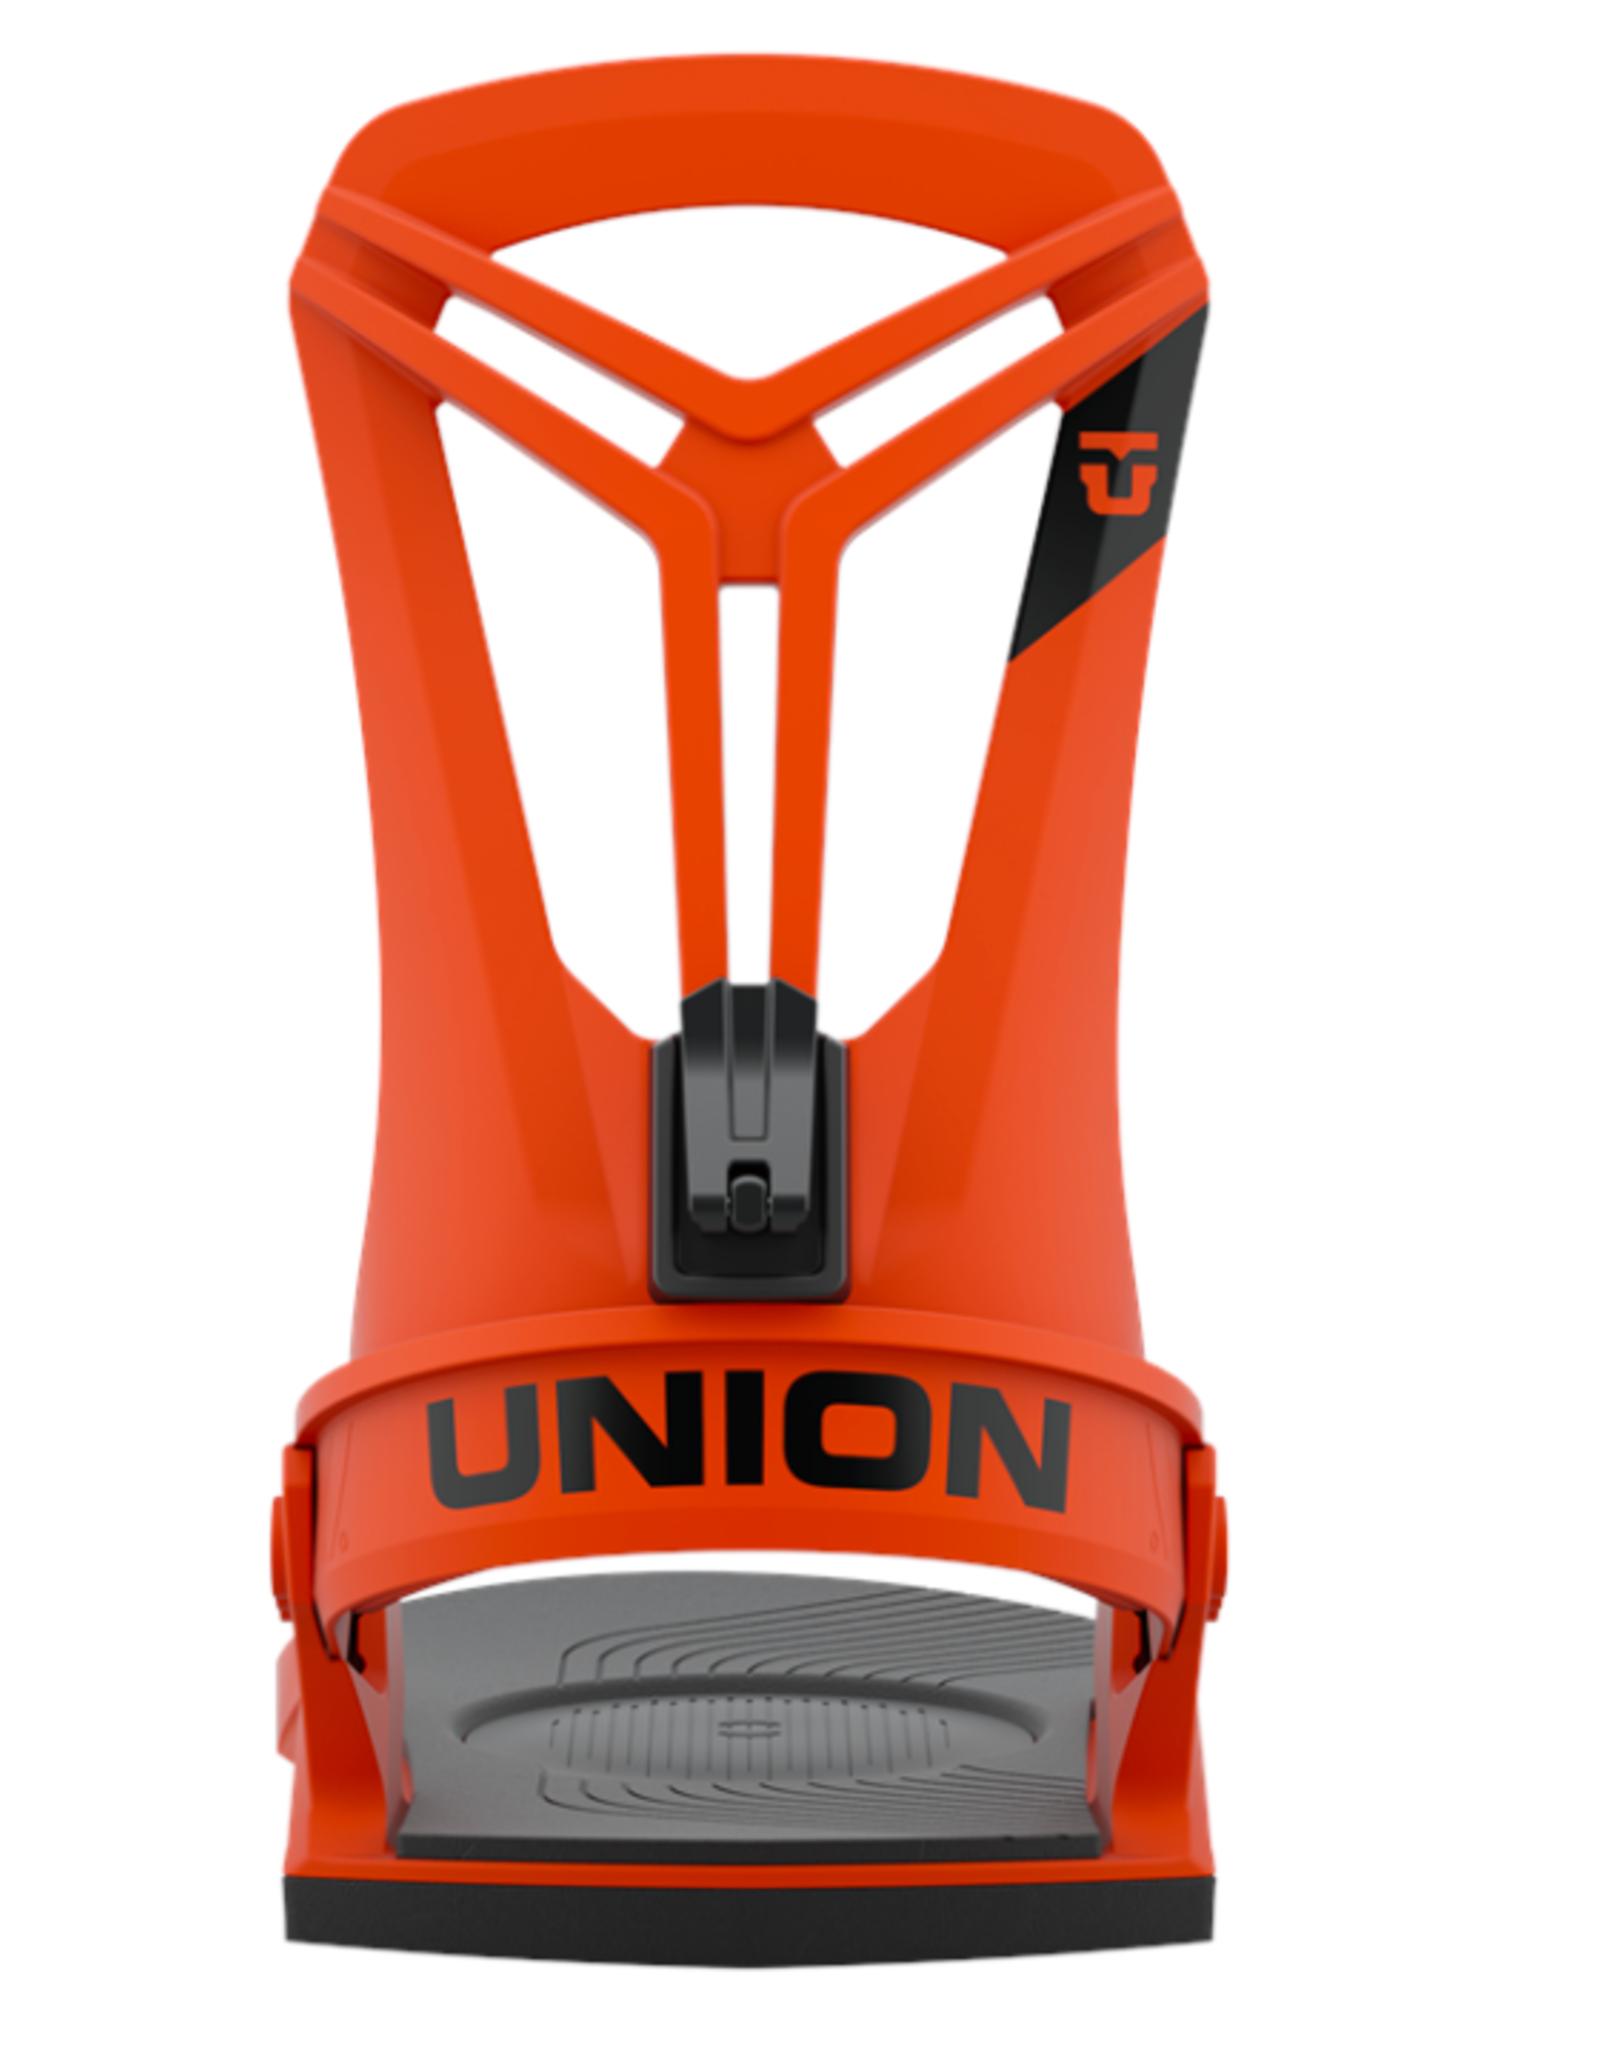 UNION Union Men's Flite Pro Bindings Orange 2022